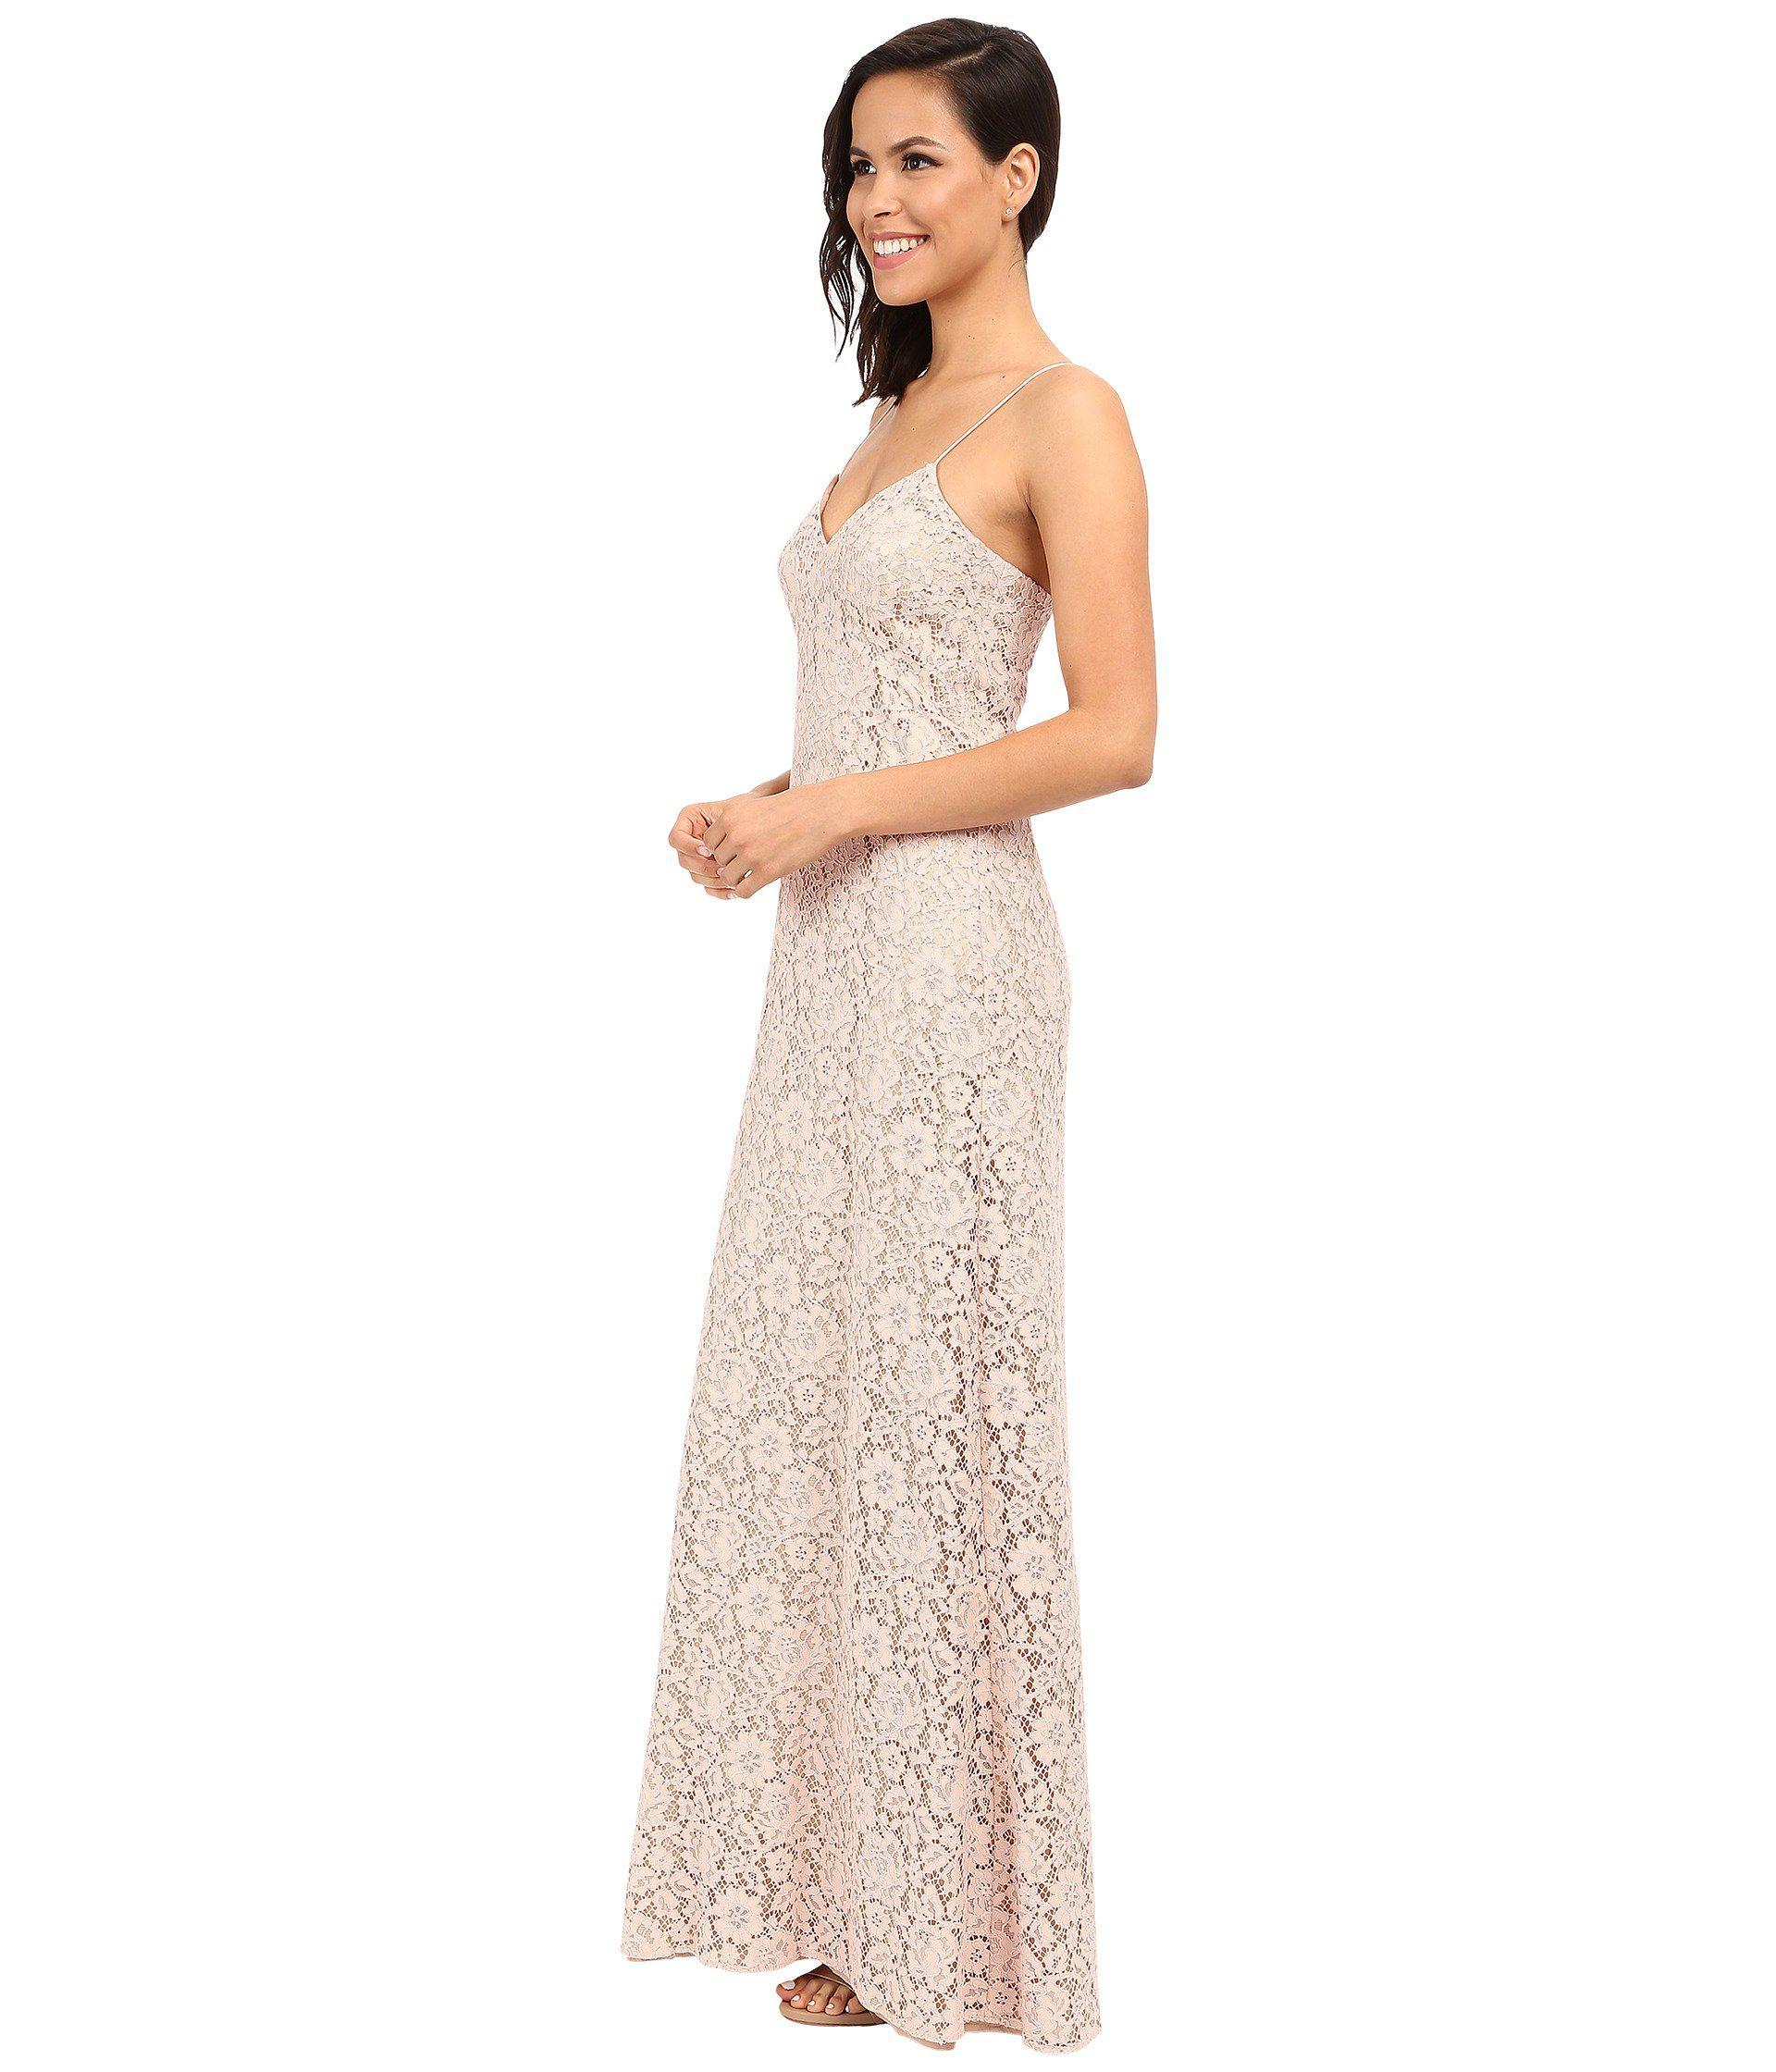 ea5140469bd Lyst - Donna Morgan Gia Spaghetti Strap Slip Dress in Pink - Save 57%